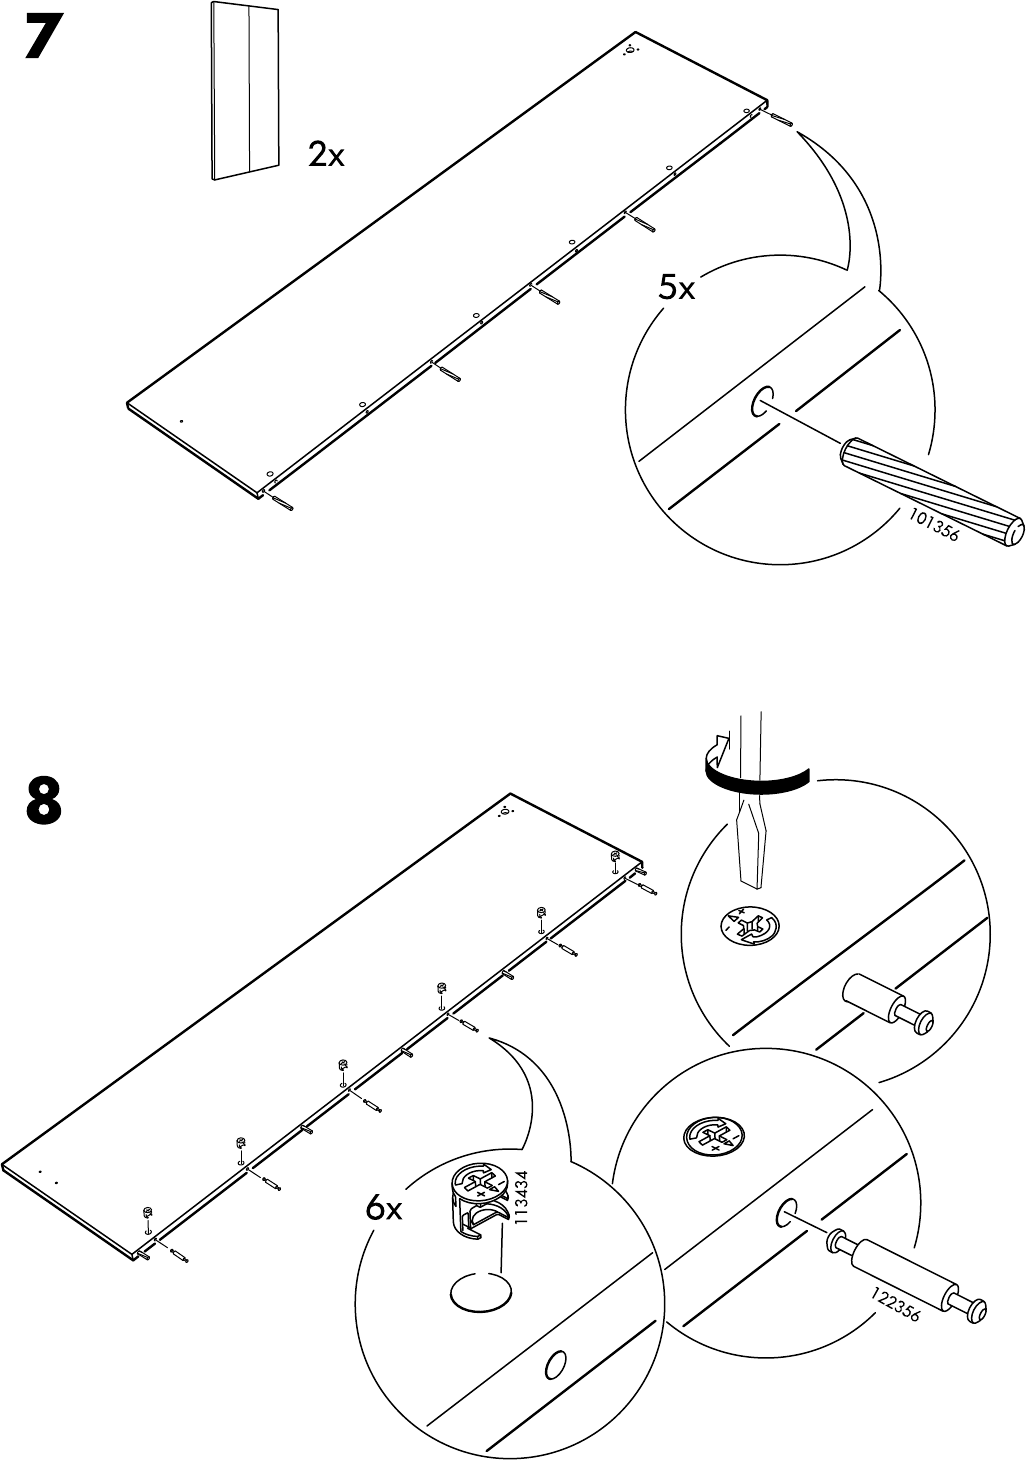 Handleiding Ikea Pax Hasvik 200 236 Pagina 10 Van 32